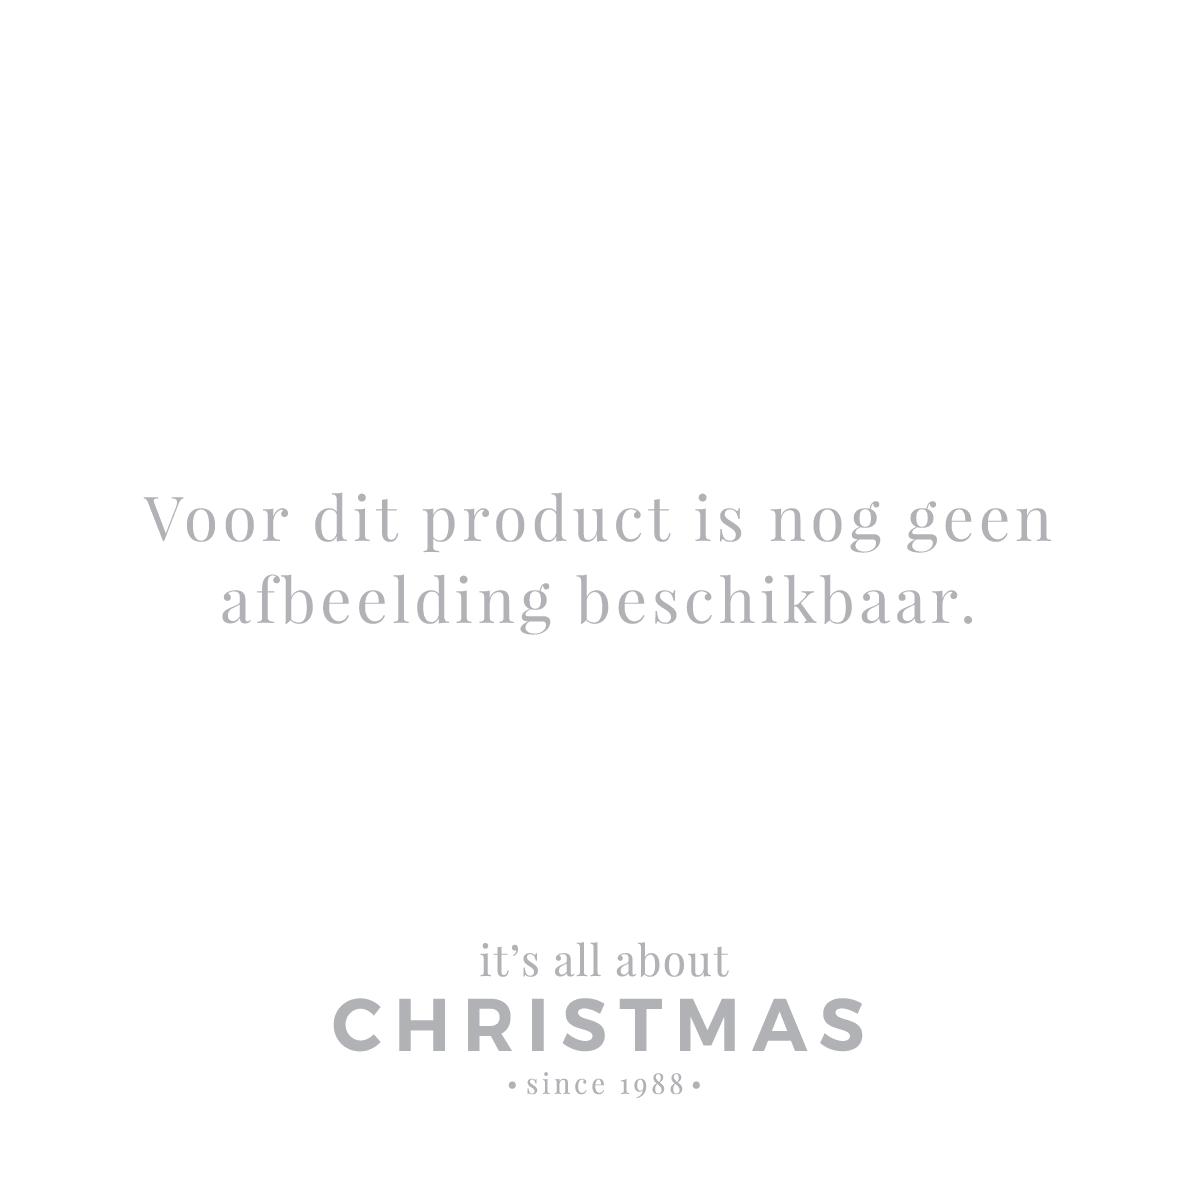 Weihnachtskugeln Kupfer.12 Kunststoff Christbaumkugeln Kupfer 7 Cm It S All About Christmas